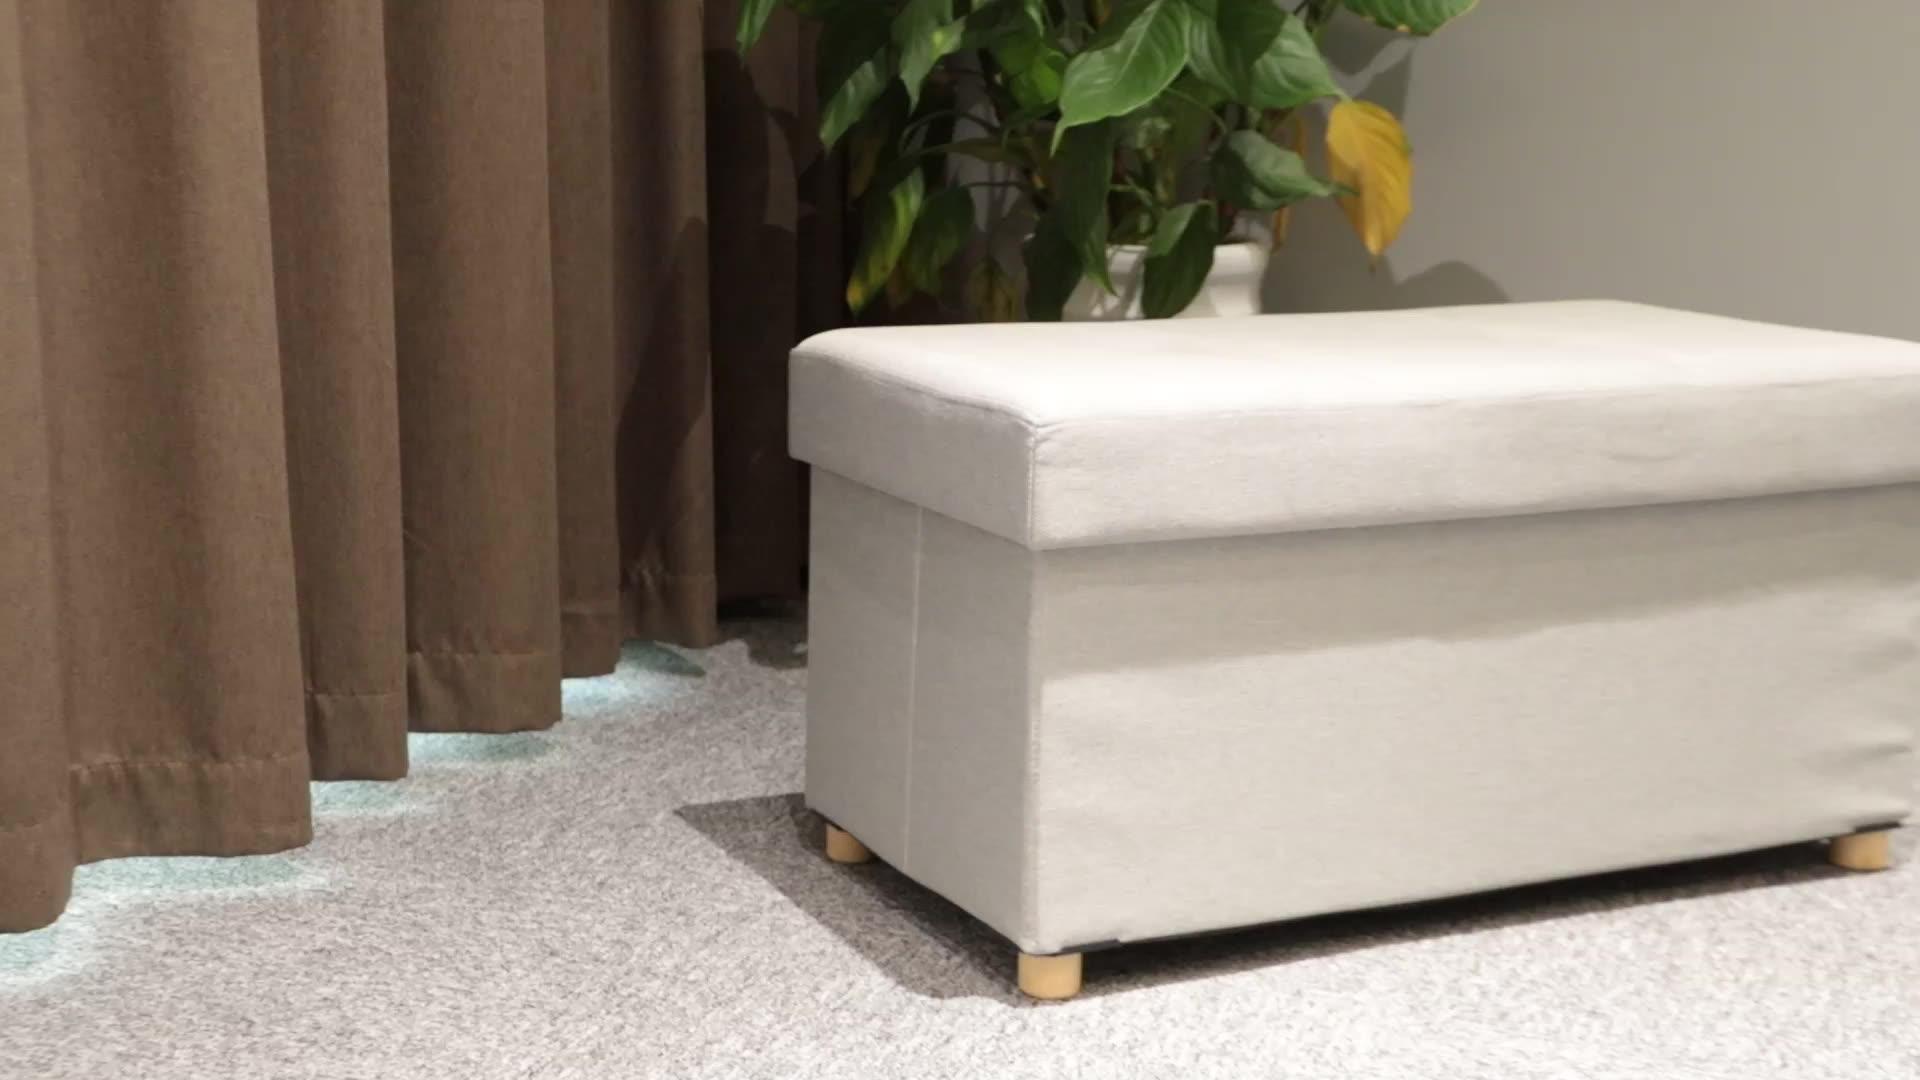 Room bench folding storage seat ottoman with box